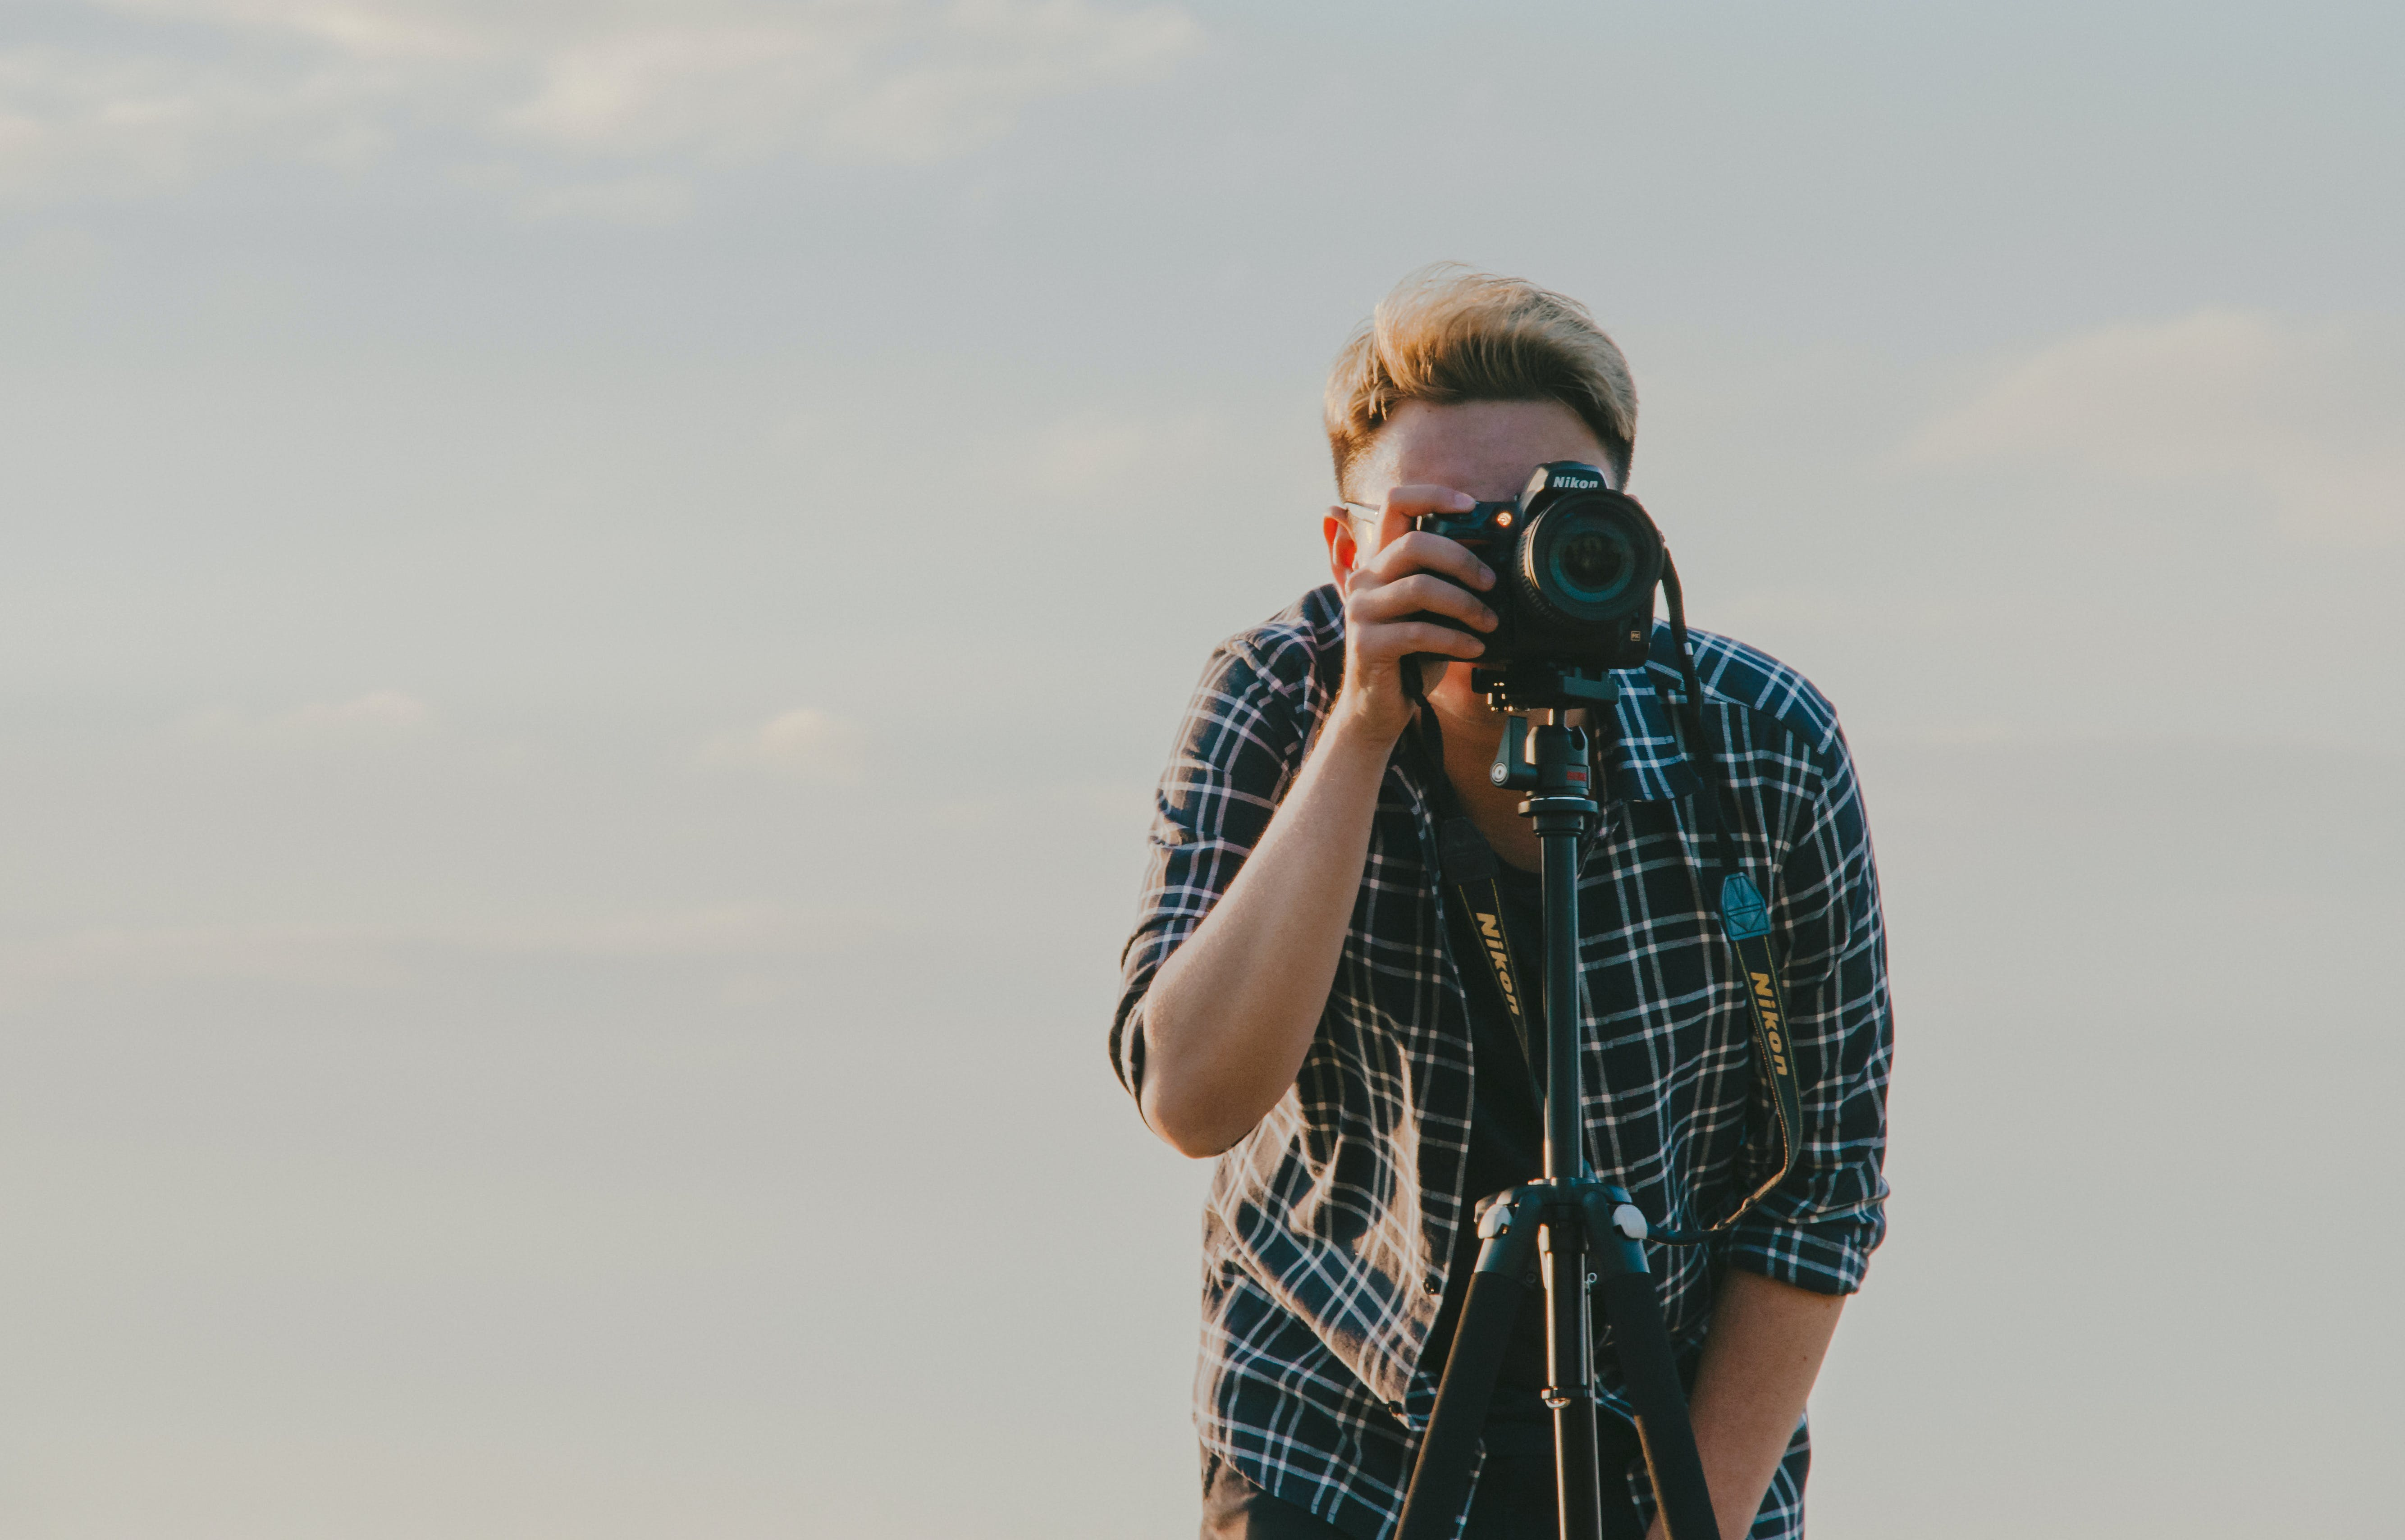 Man Holding Dslr Camera With Tripod